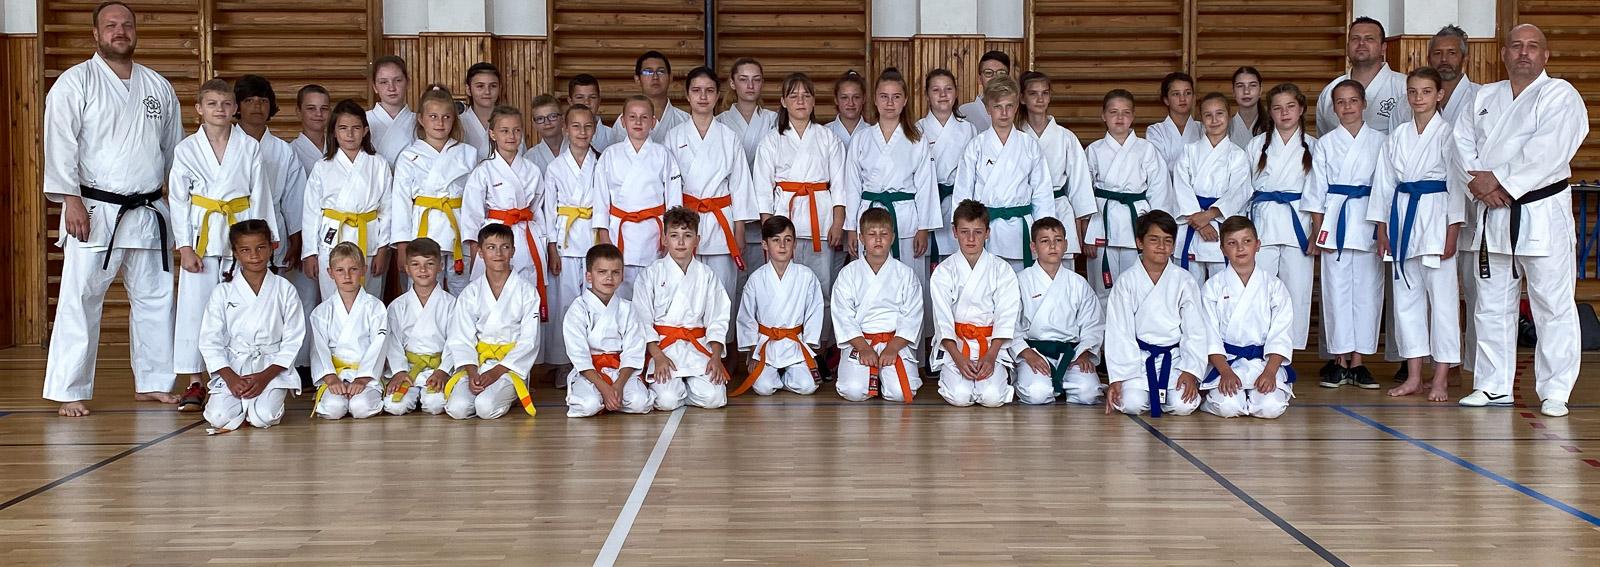 https://karate-slovakia.sk/wp-content/uploads/2021/01/talentovana-mladez.jpg